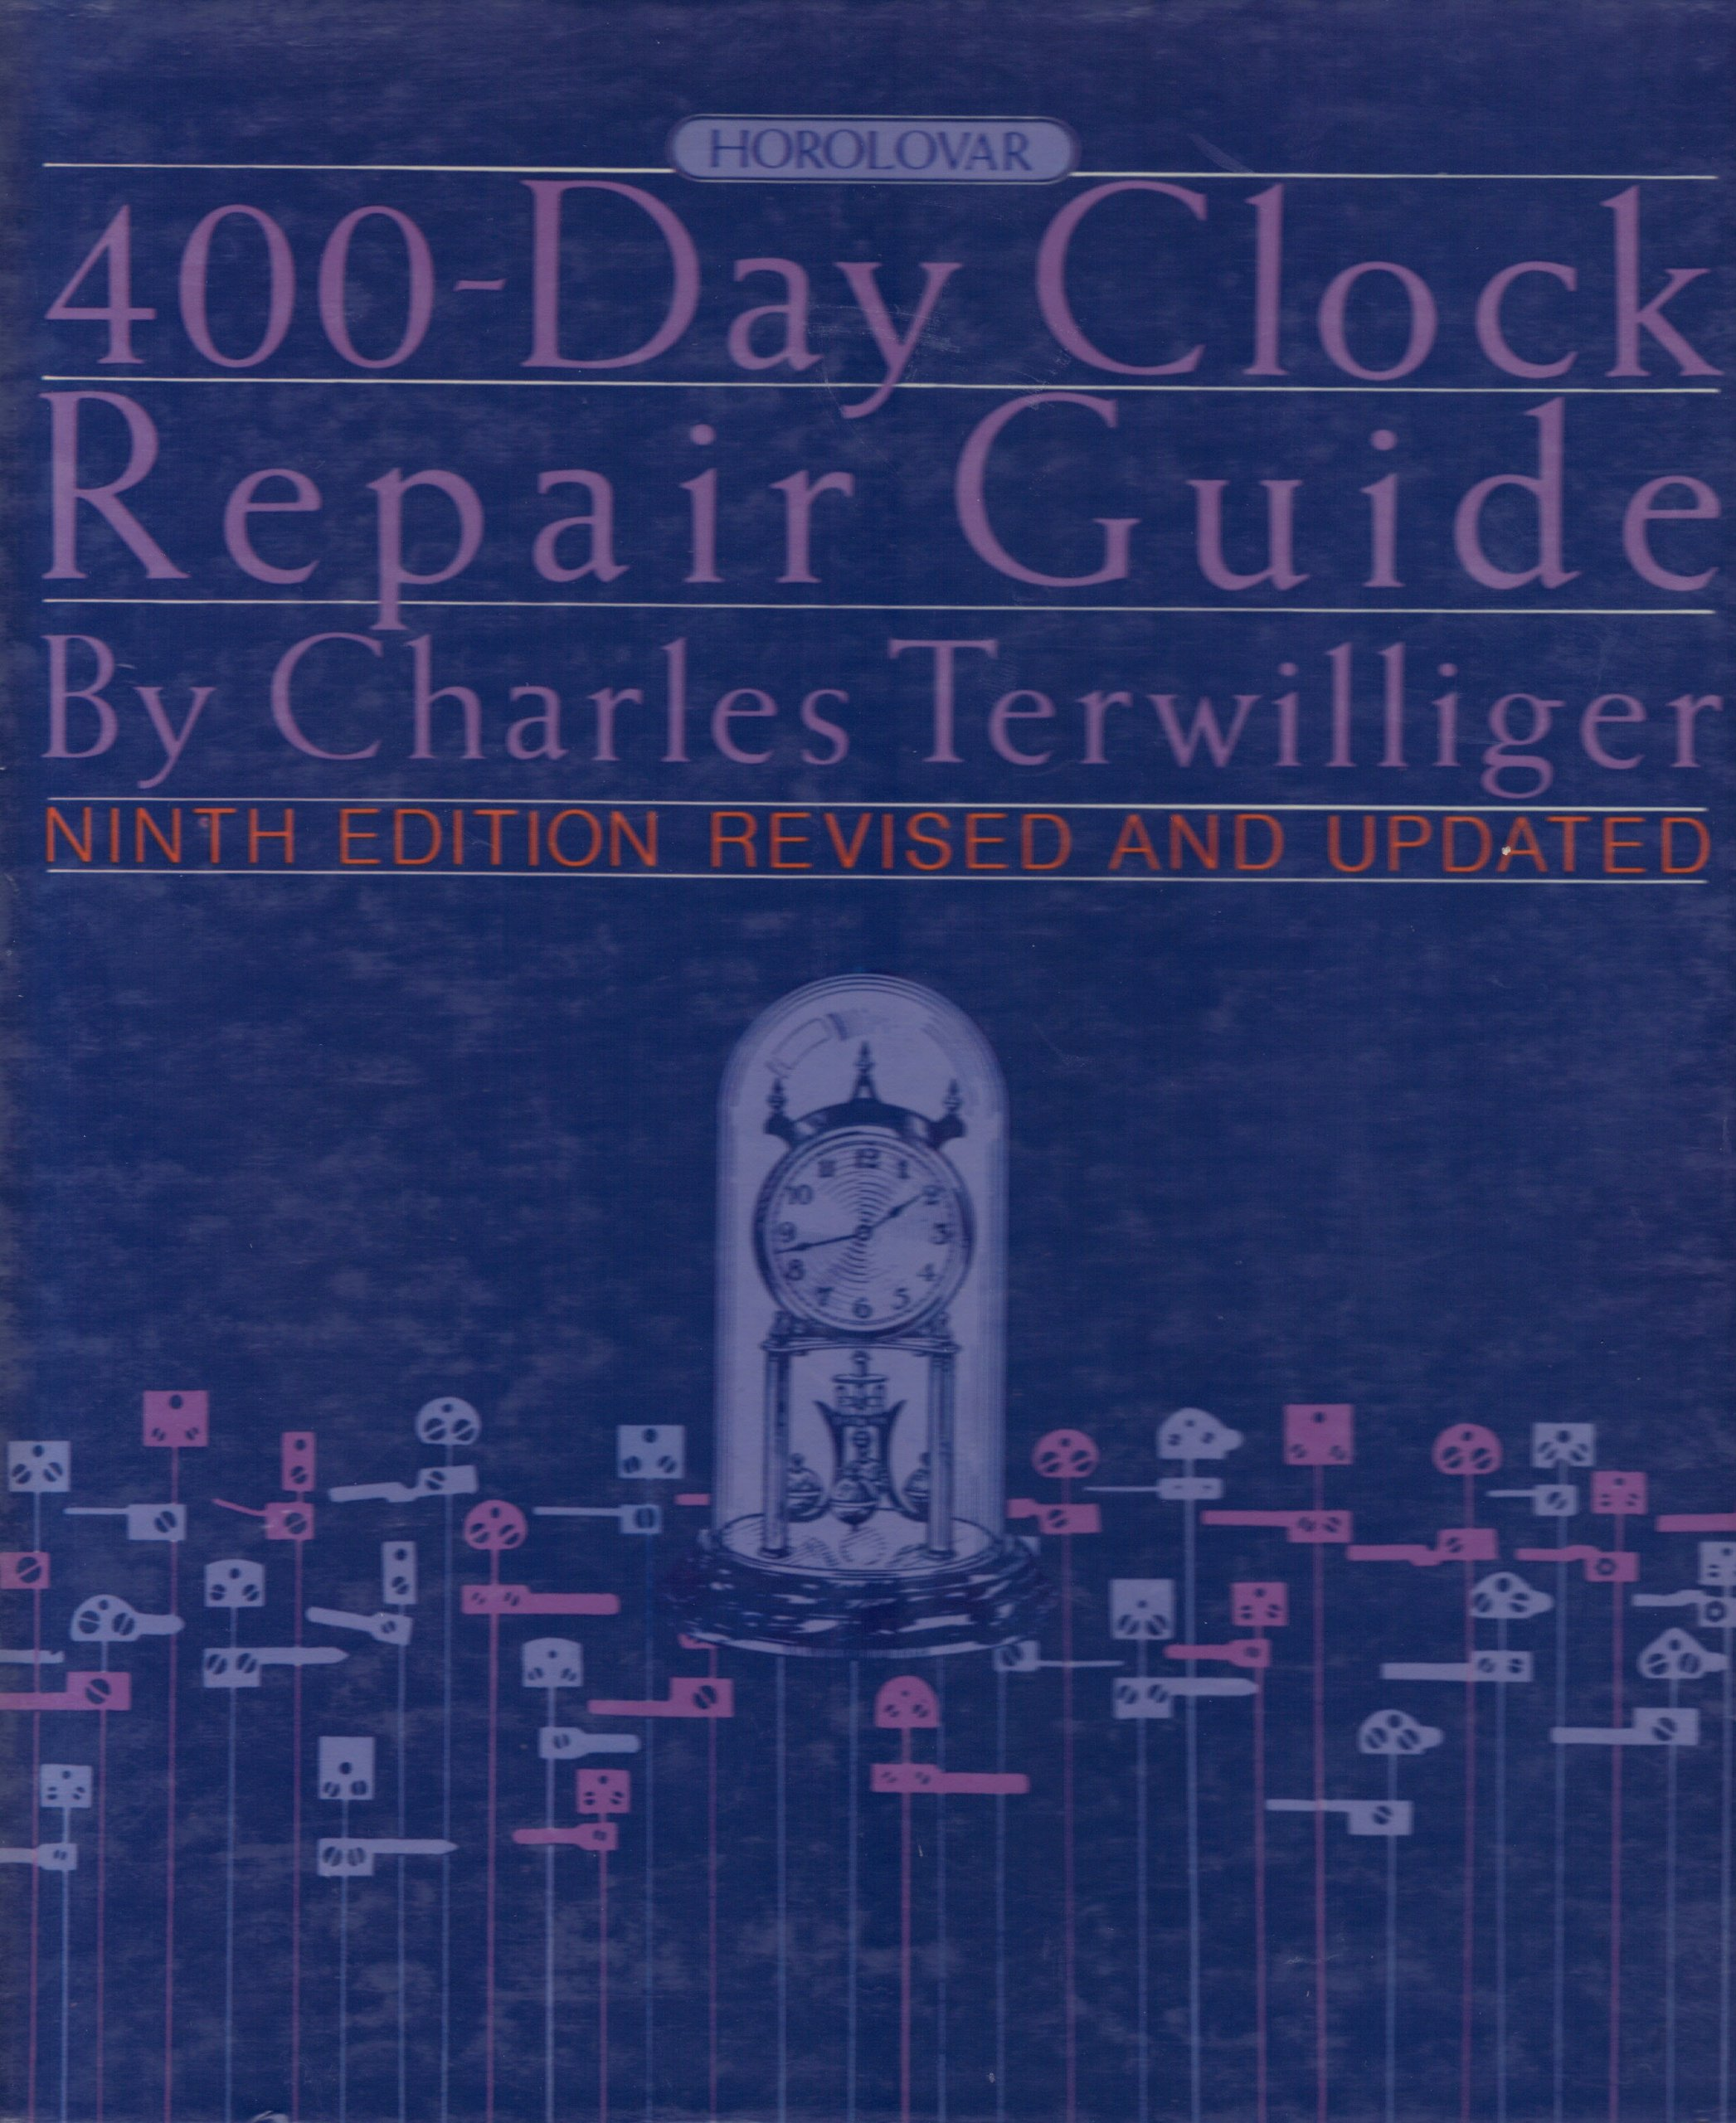 Horolovar 400 Day Clock Repair Guide: Amazon.es: Charls Terwilliger: Libros